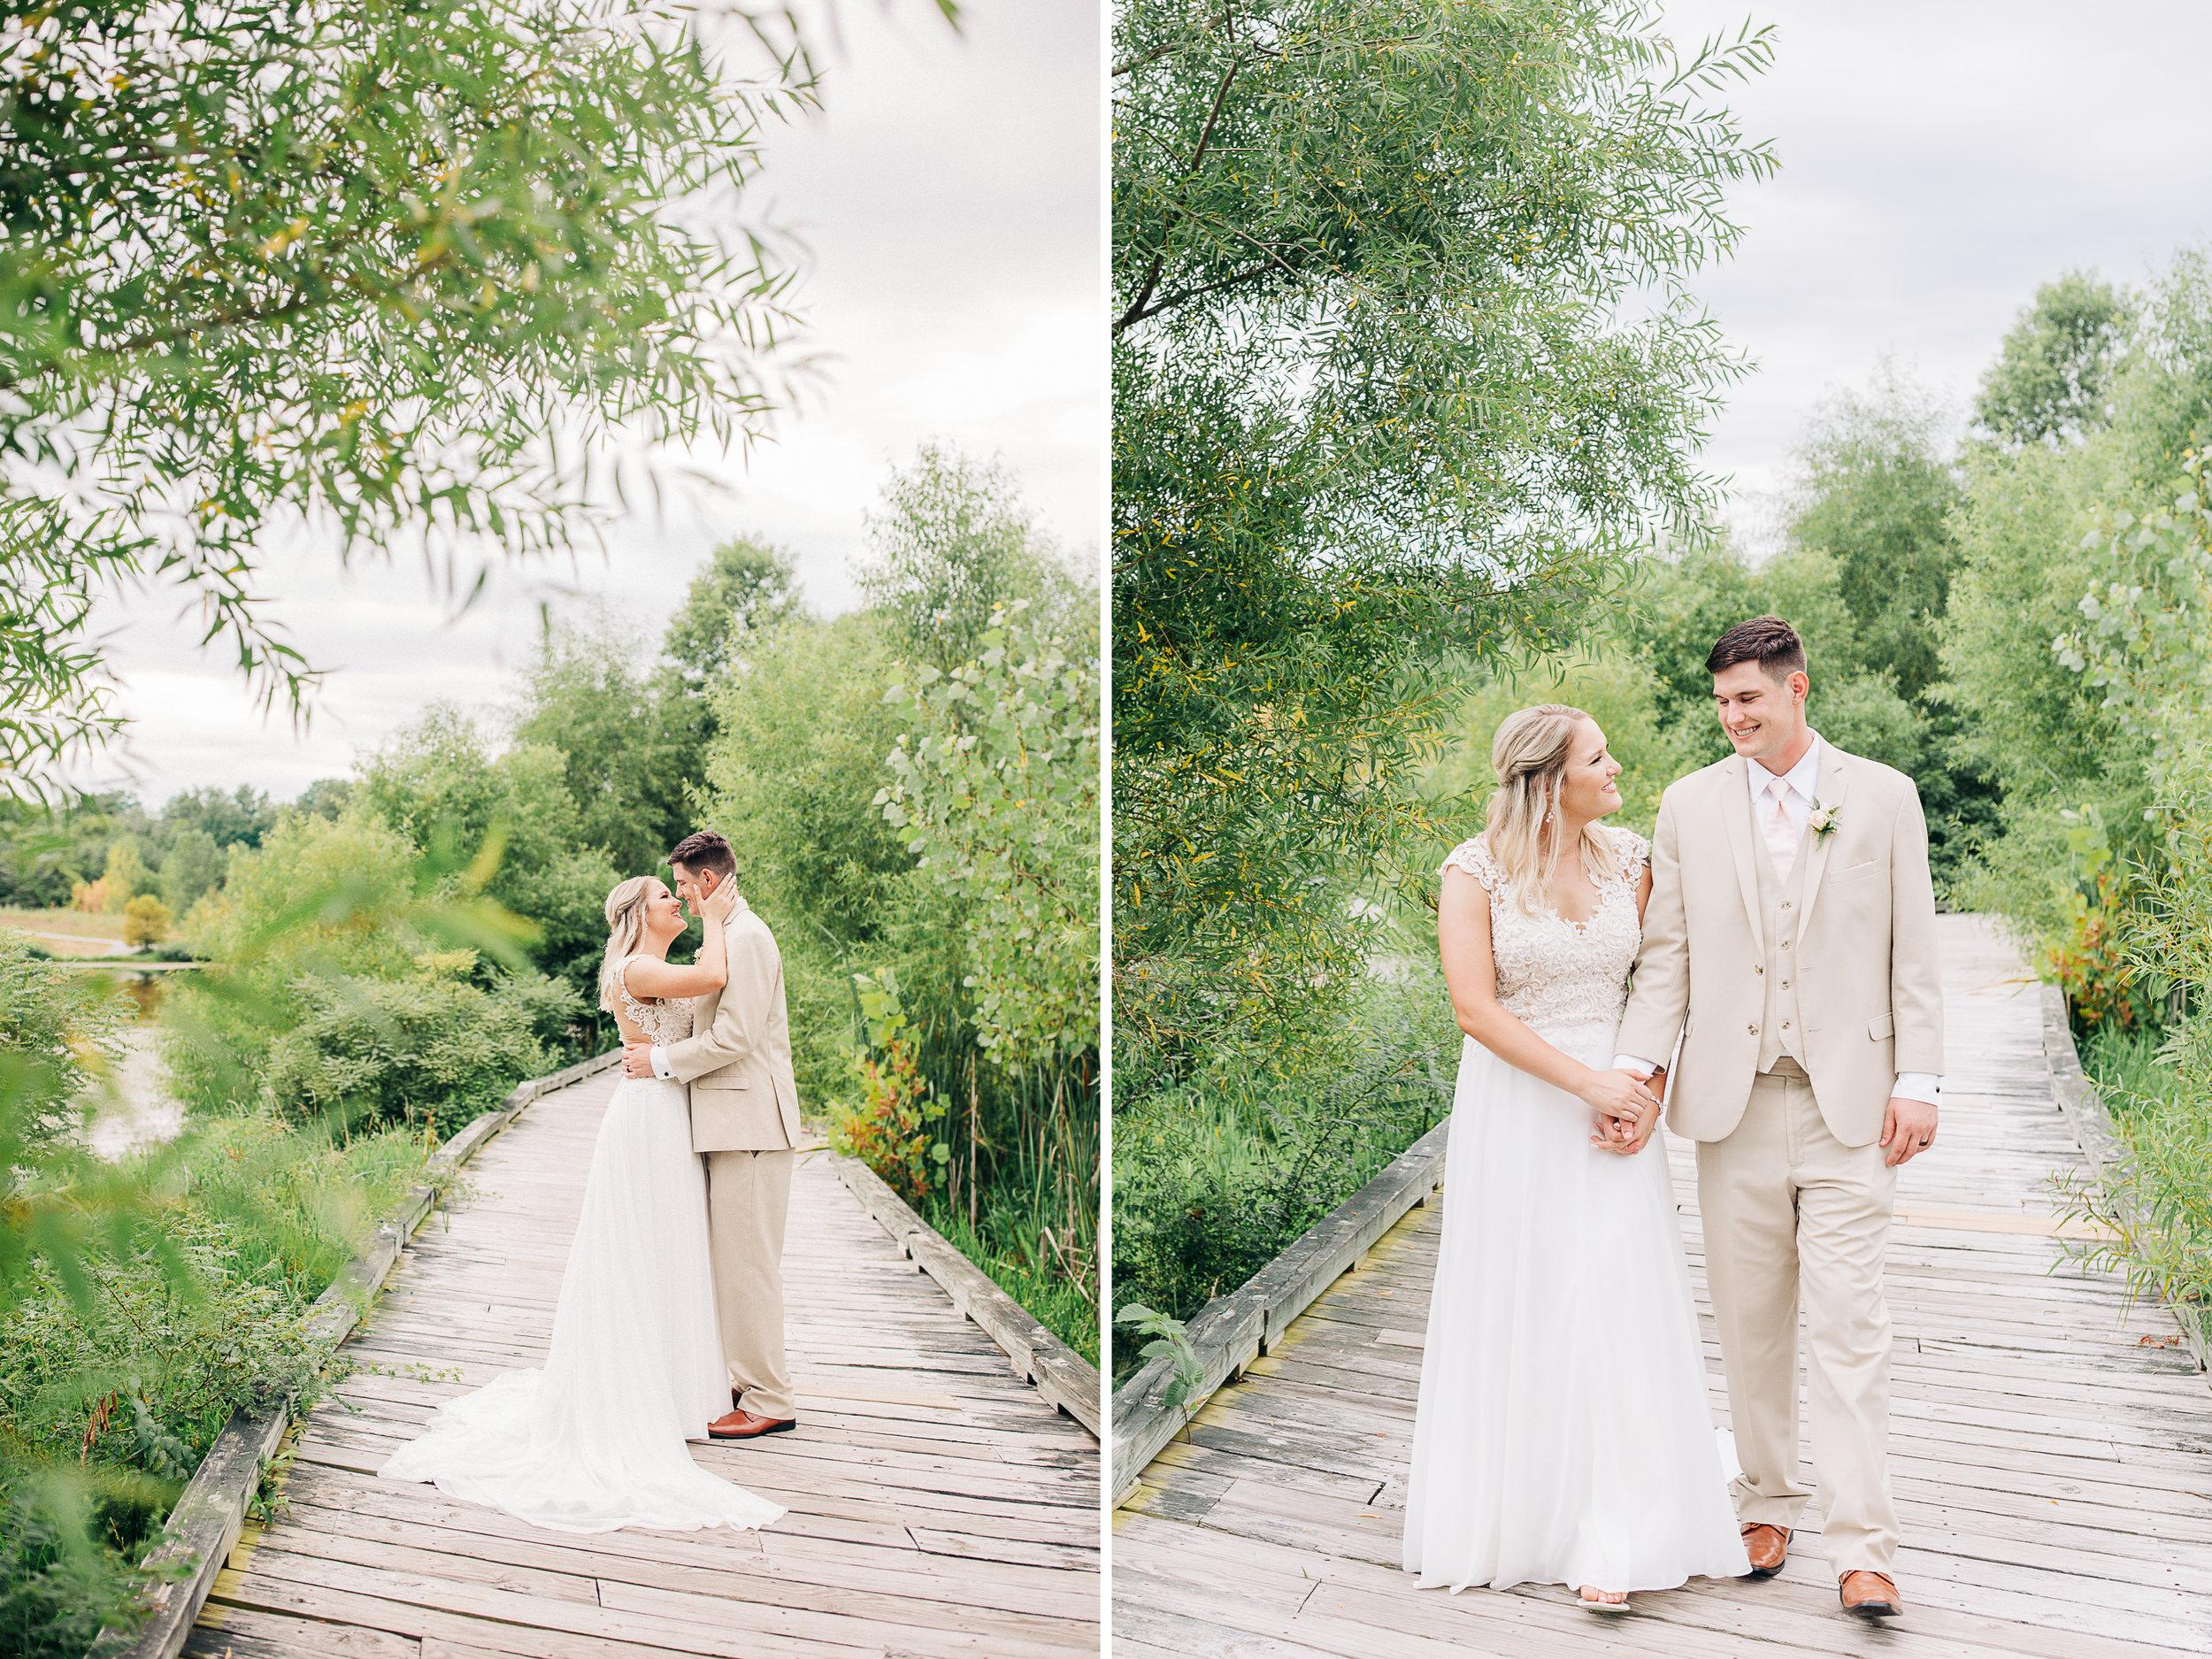 Dorothy_Louise_Photography_Marissa_Jake_Wentzville_MO_Wedding19.jpg